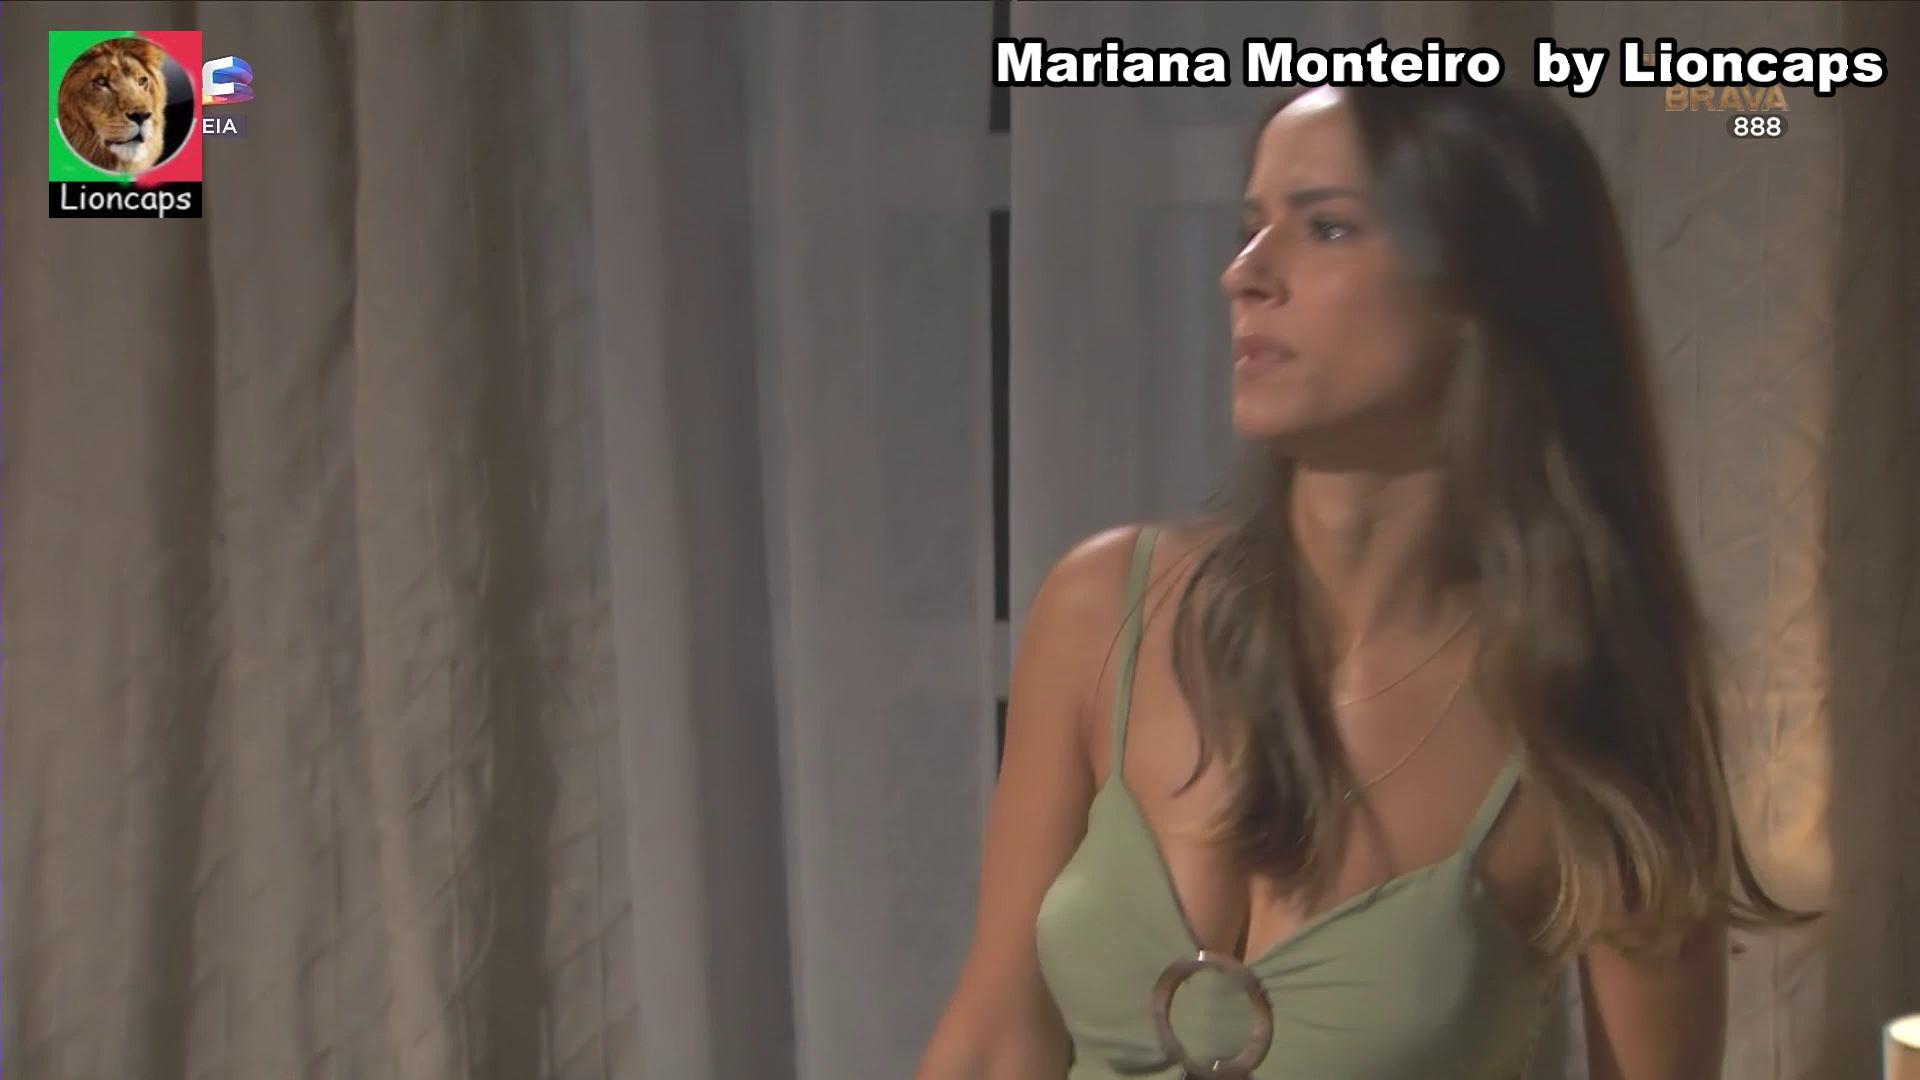 634936392_mariana_monteiro_vs191124_2717_122_136lo.JPG